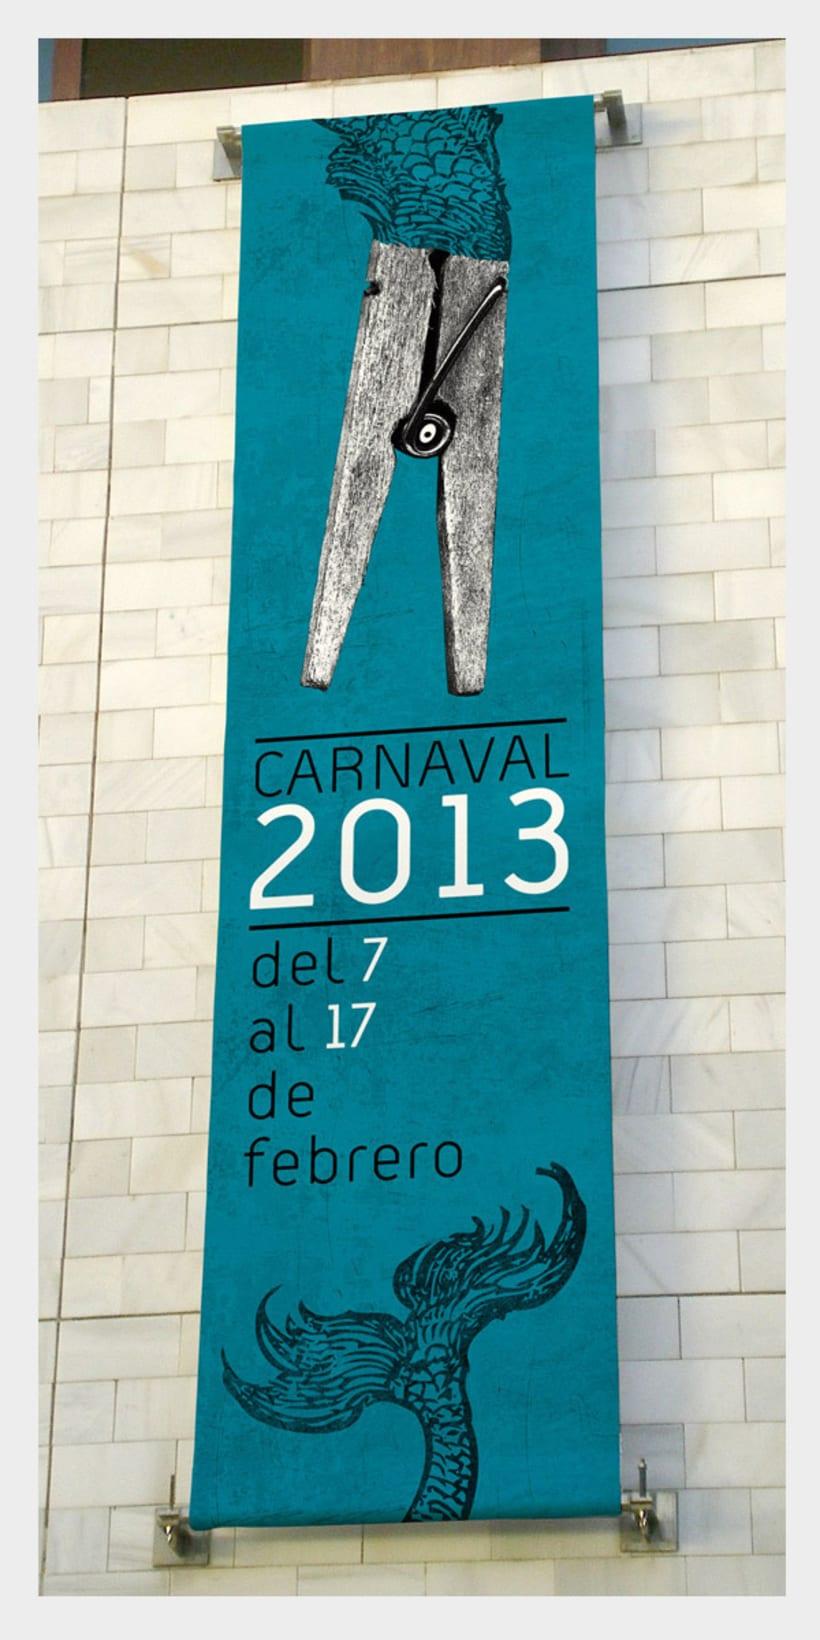 Carnaval 2013 2